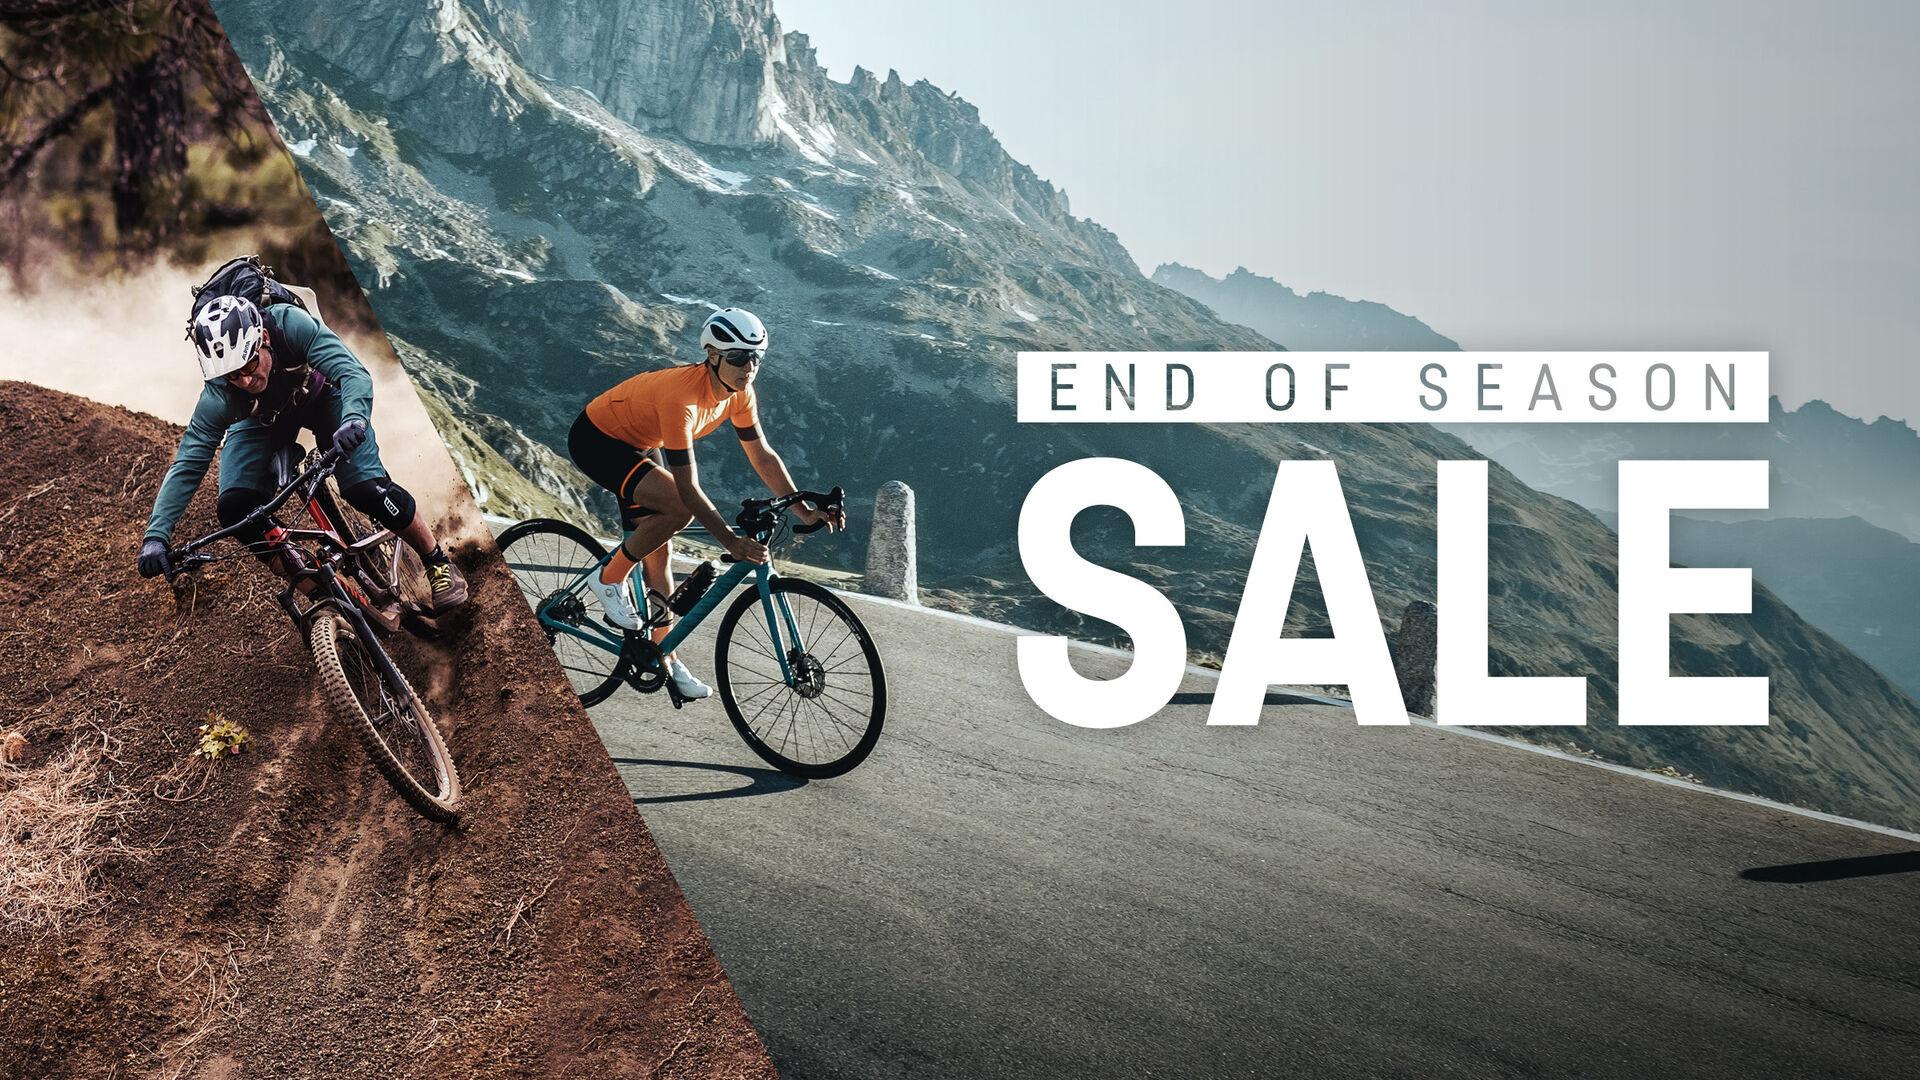 Canyon End of Season Sale 2019